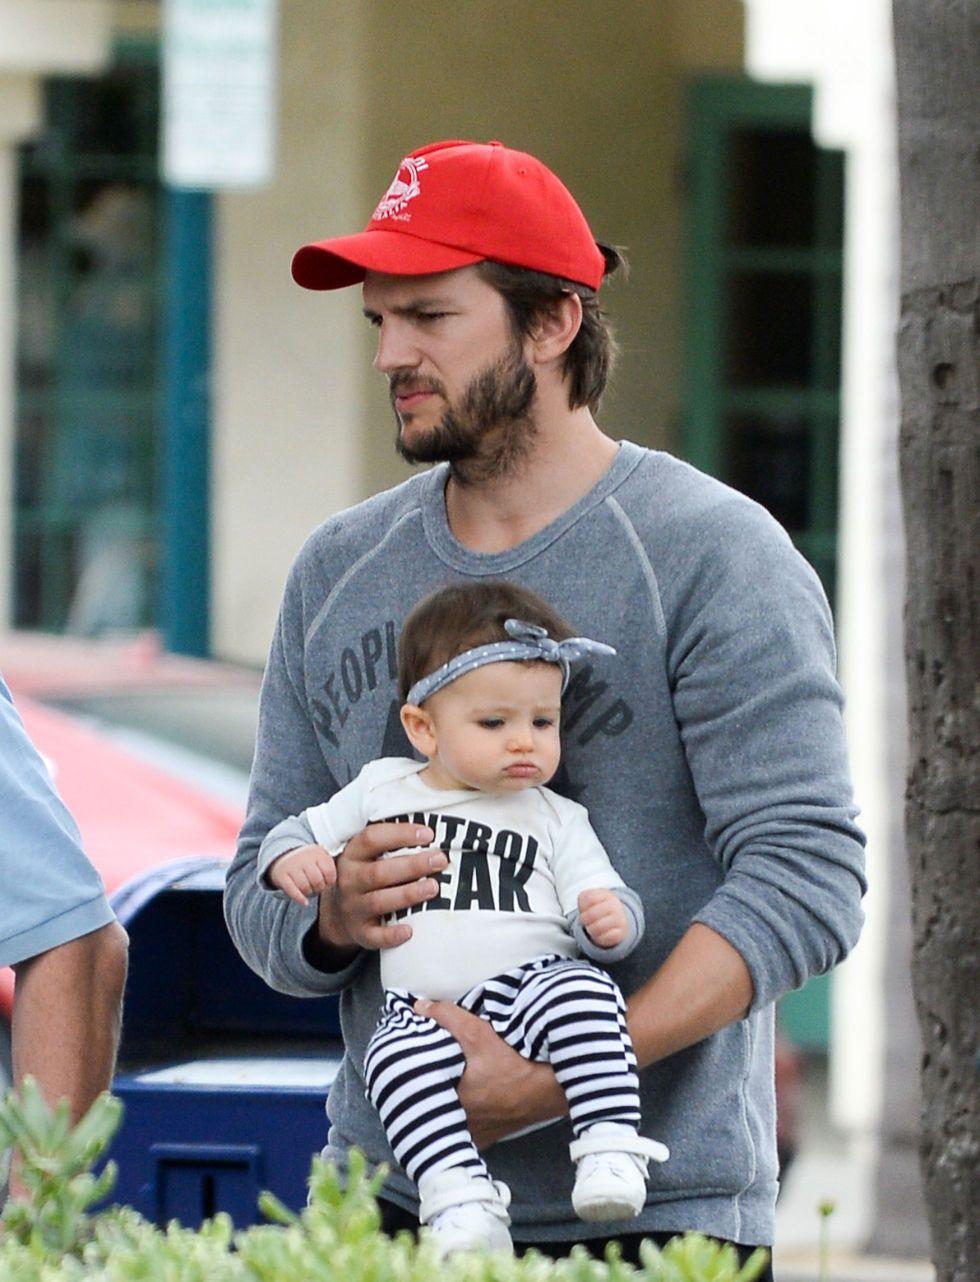 Ashton Kutcher S Daughter Makes The Most Adorable Fashion